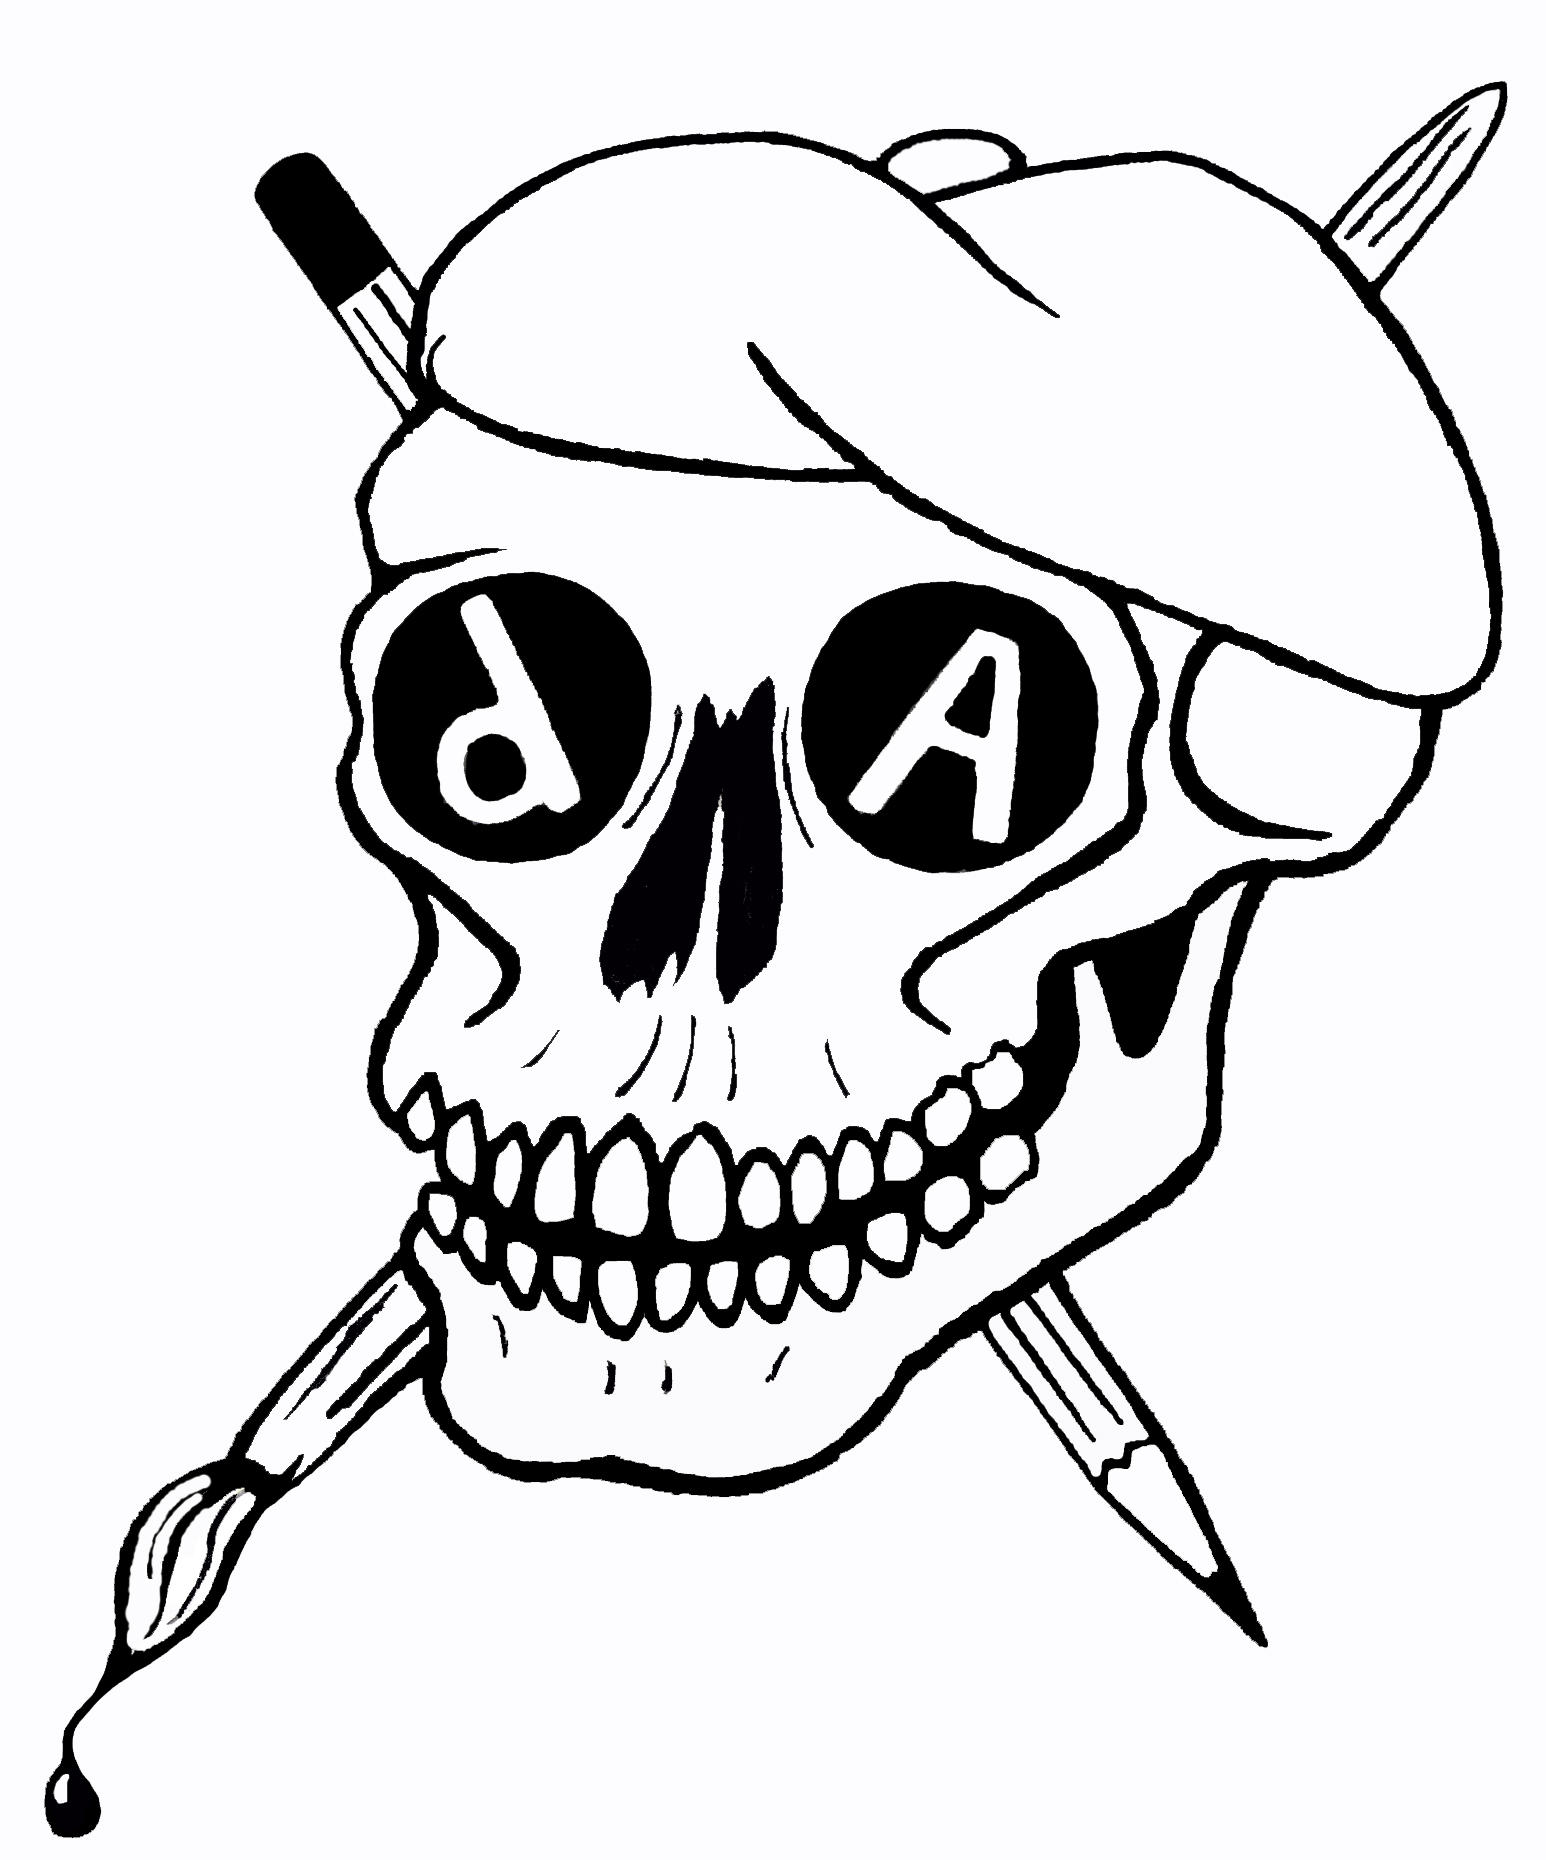 dA Skull Tatoo I by hzon-pole on DeviantArt